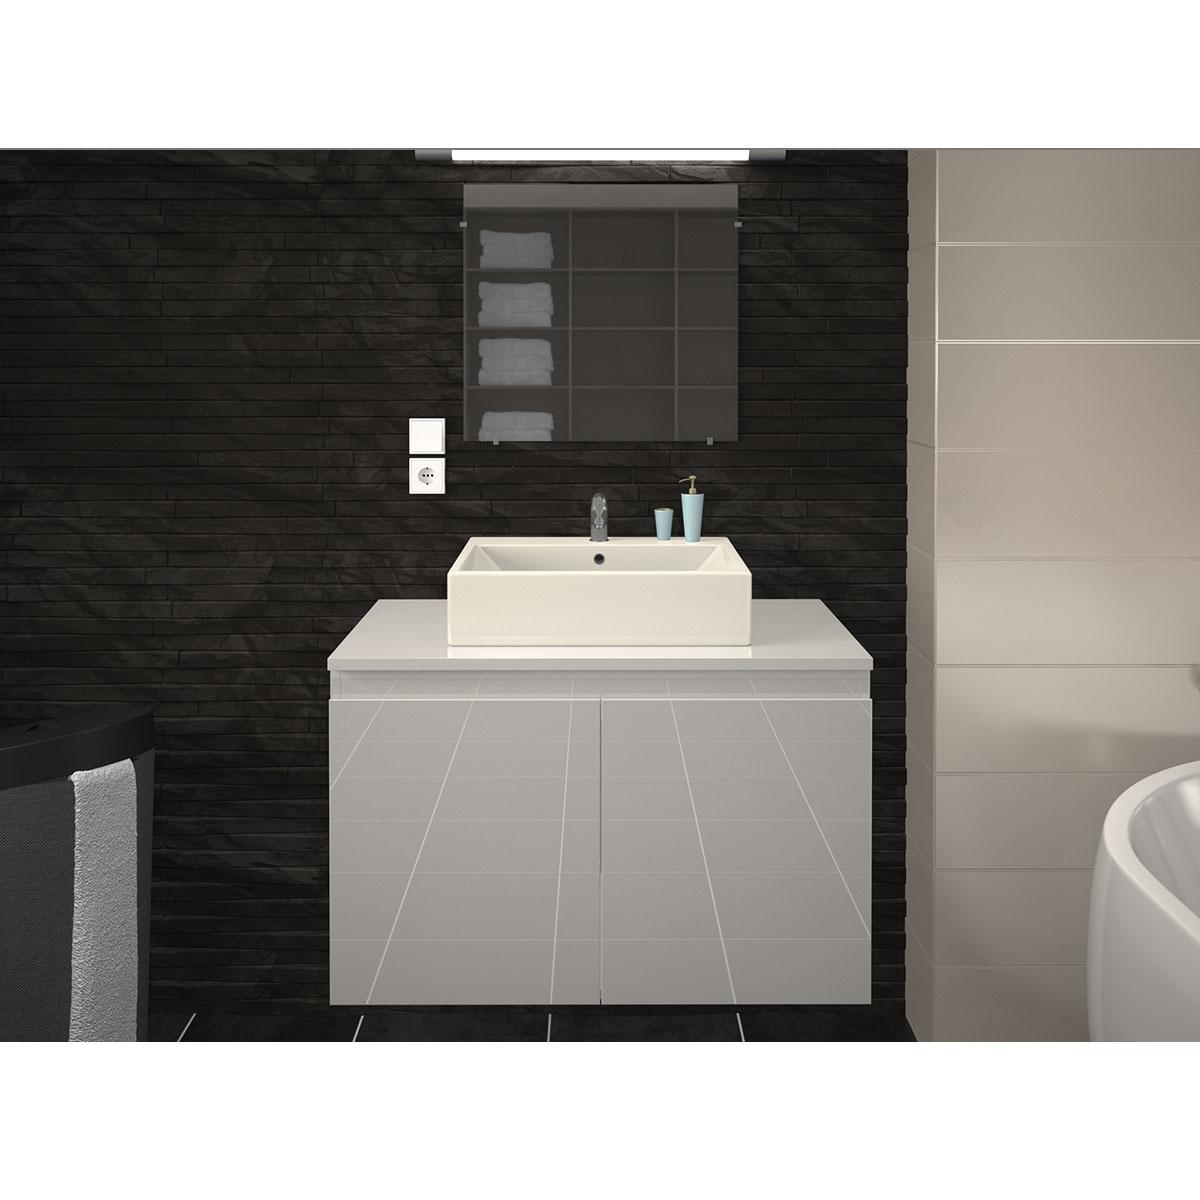 Meuble et vasque de salle de bain en 80 cm  (Blanc)